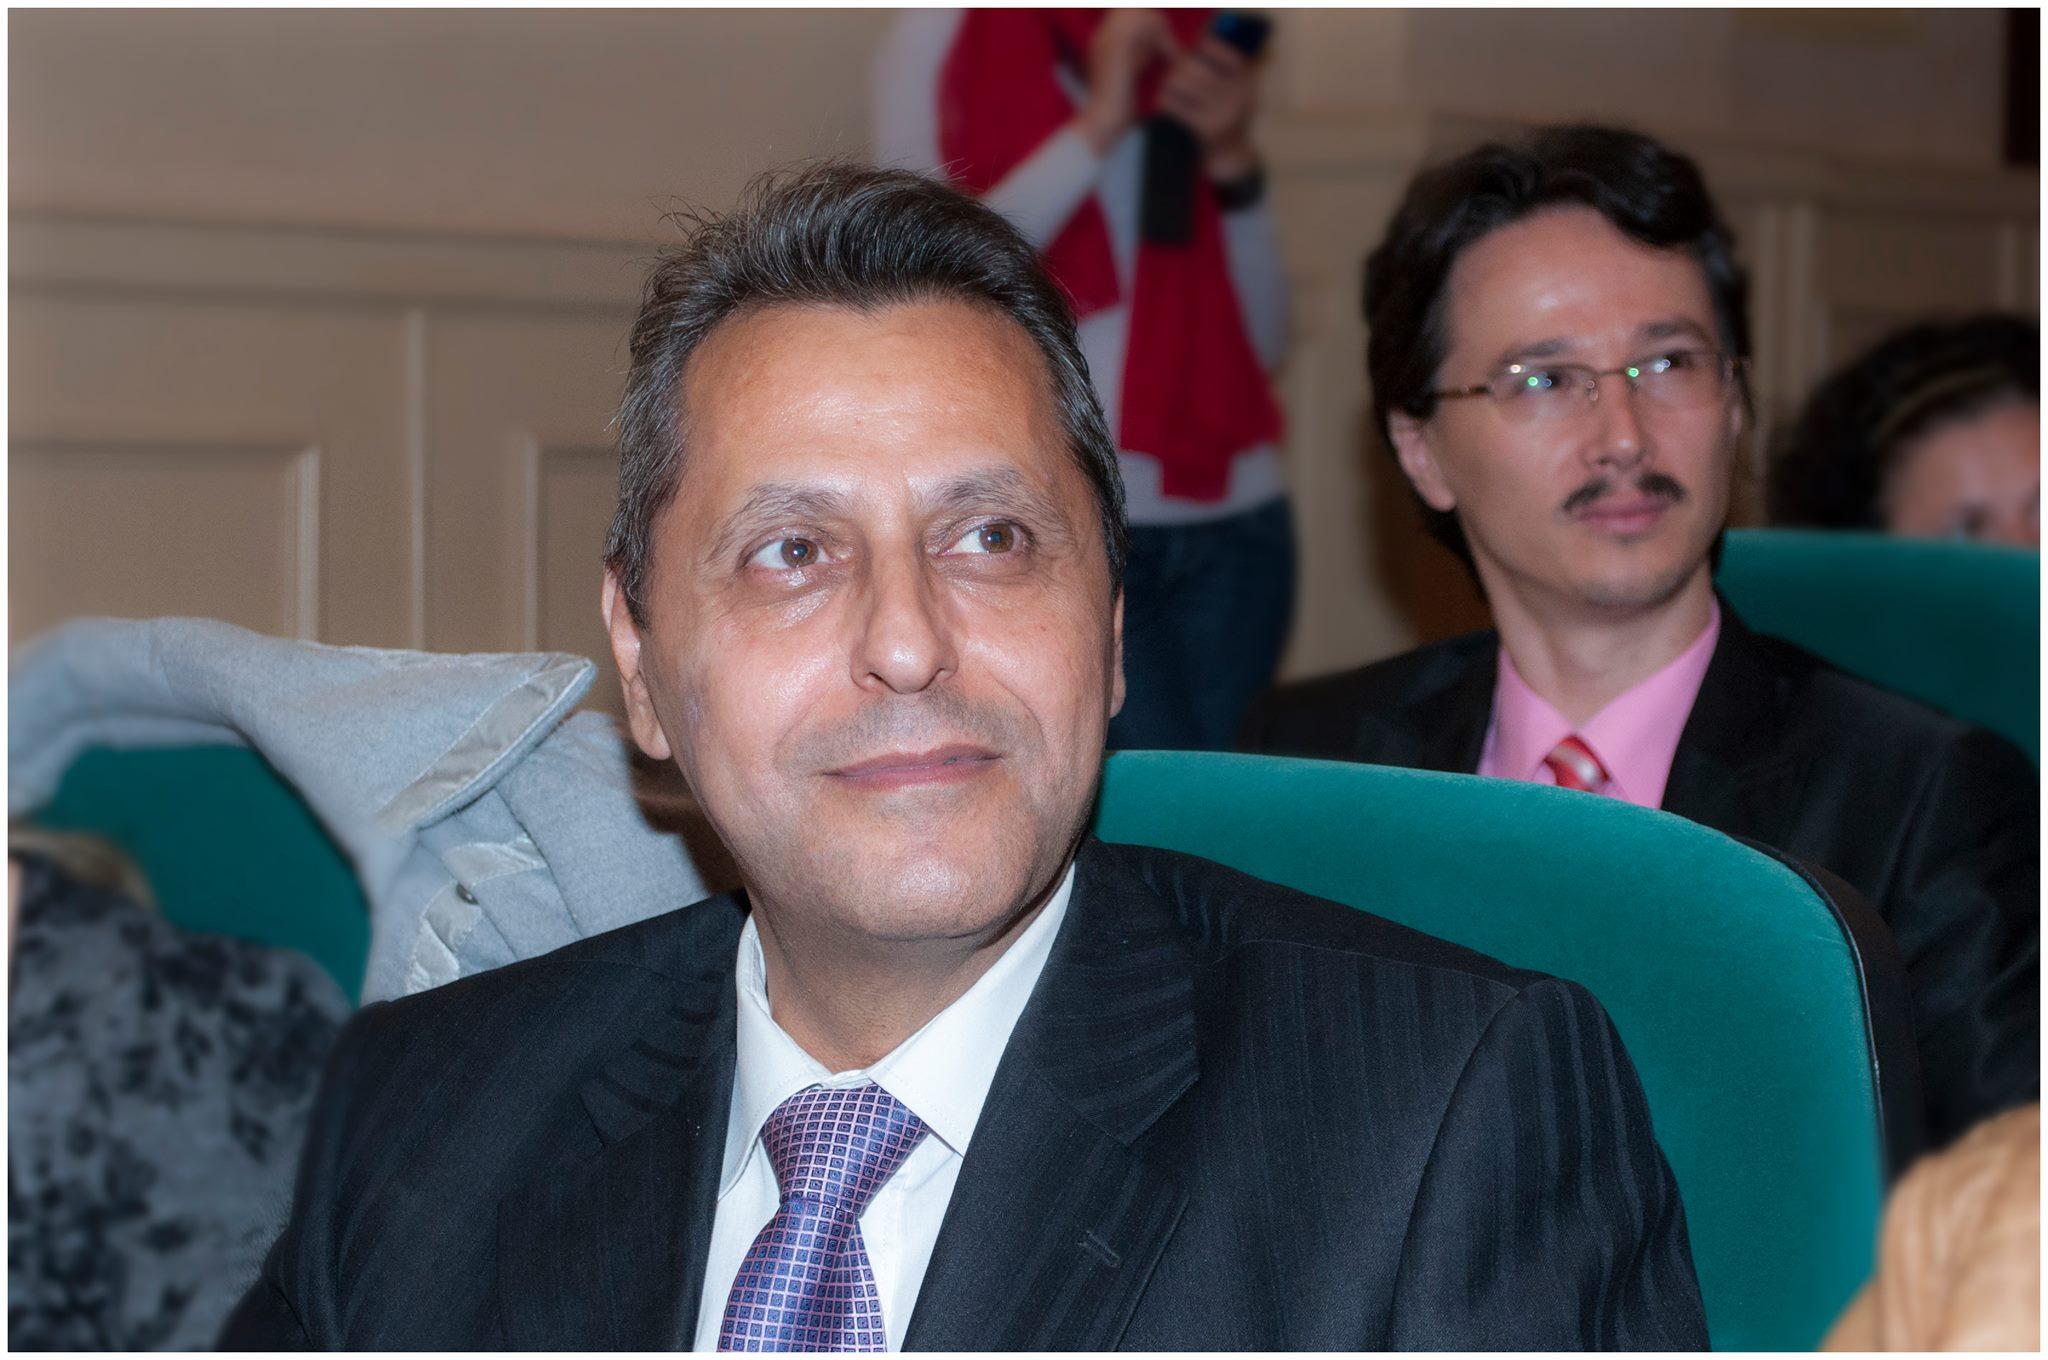 Doctor psiholog Ilie Marinescu